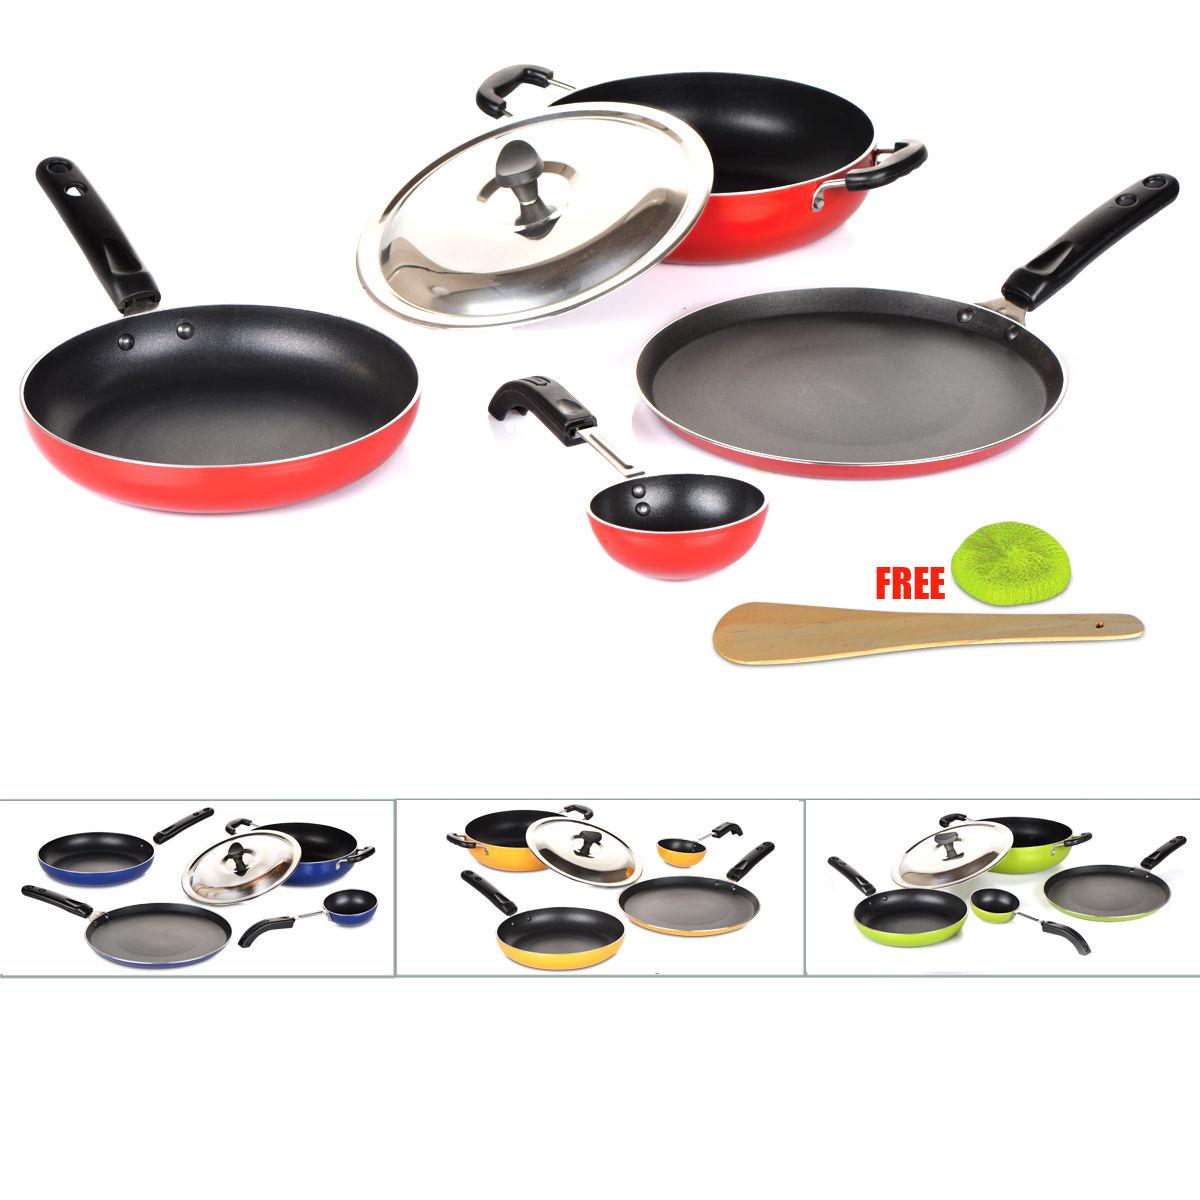 Buy 5 Pcs Coloured Induction Friendly Non Stick Cookware Set Online ...